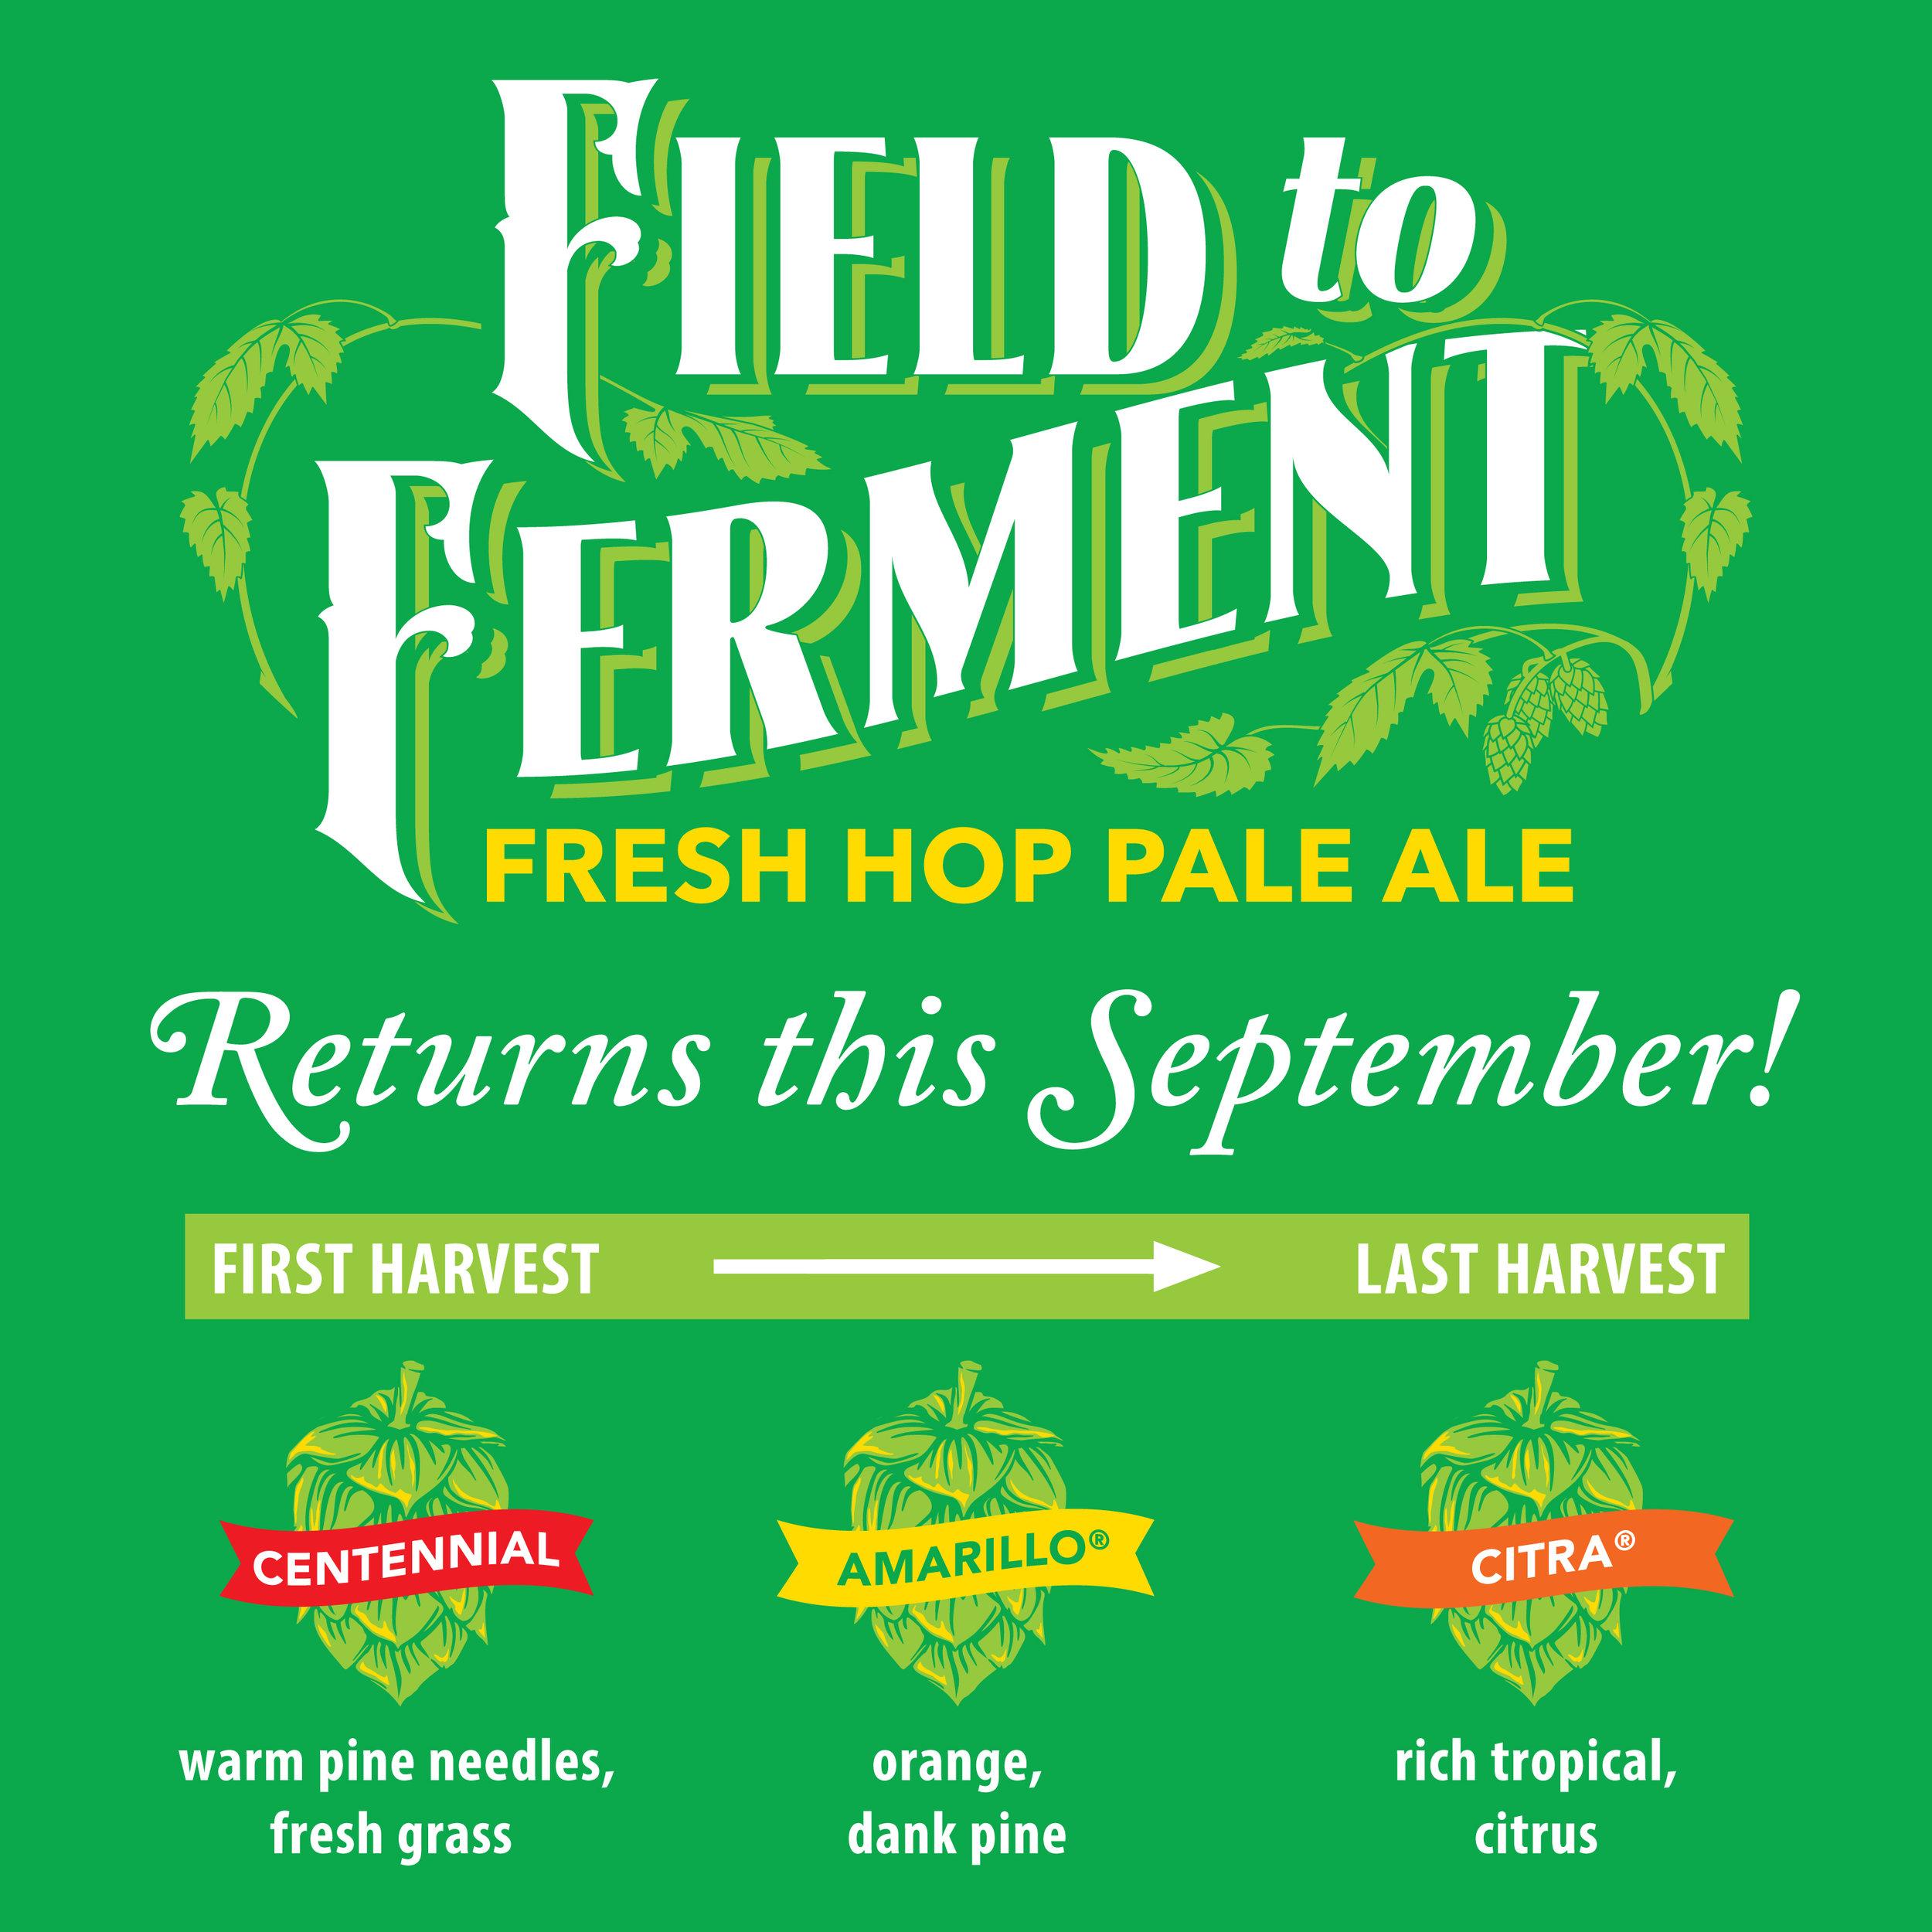 image courtesy Fremont Brewing Company